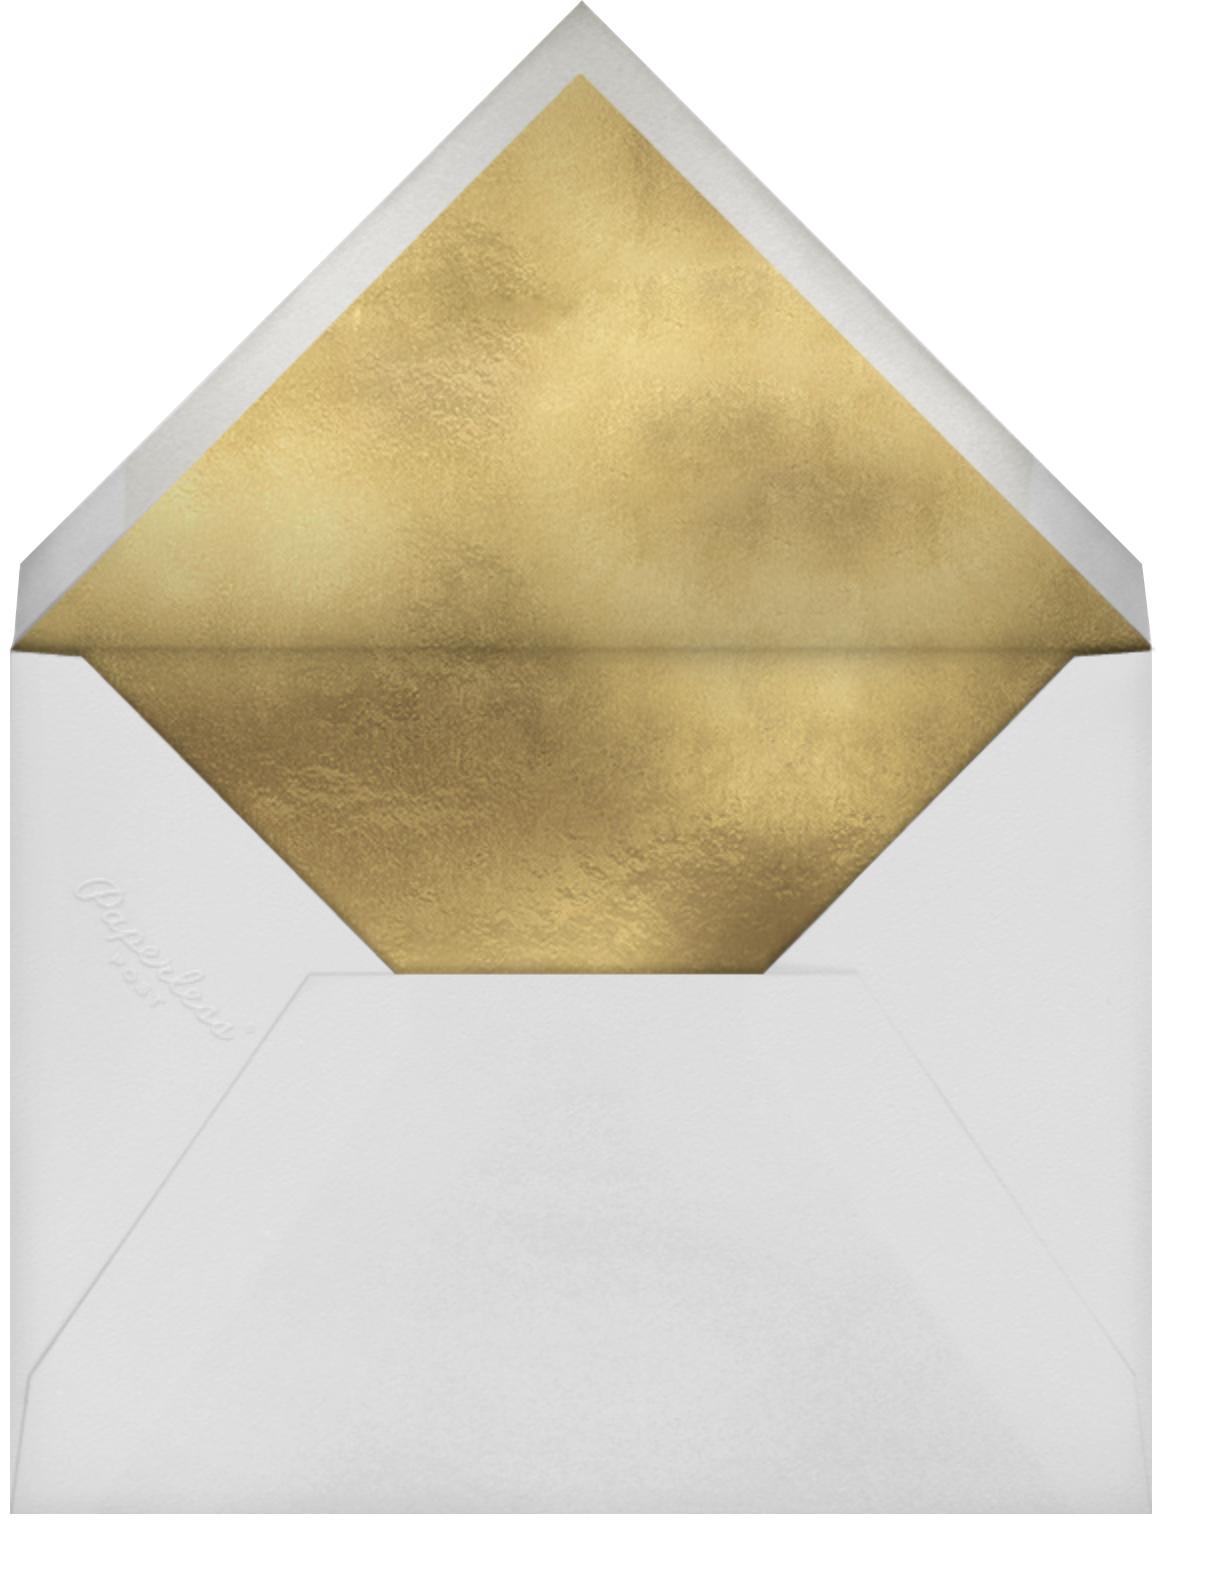 Prairie Tale - Black - kate spade new york - Save the date - envelope back